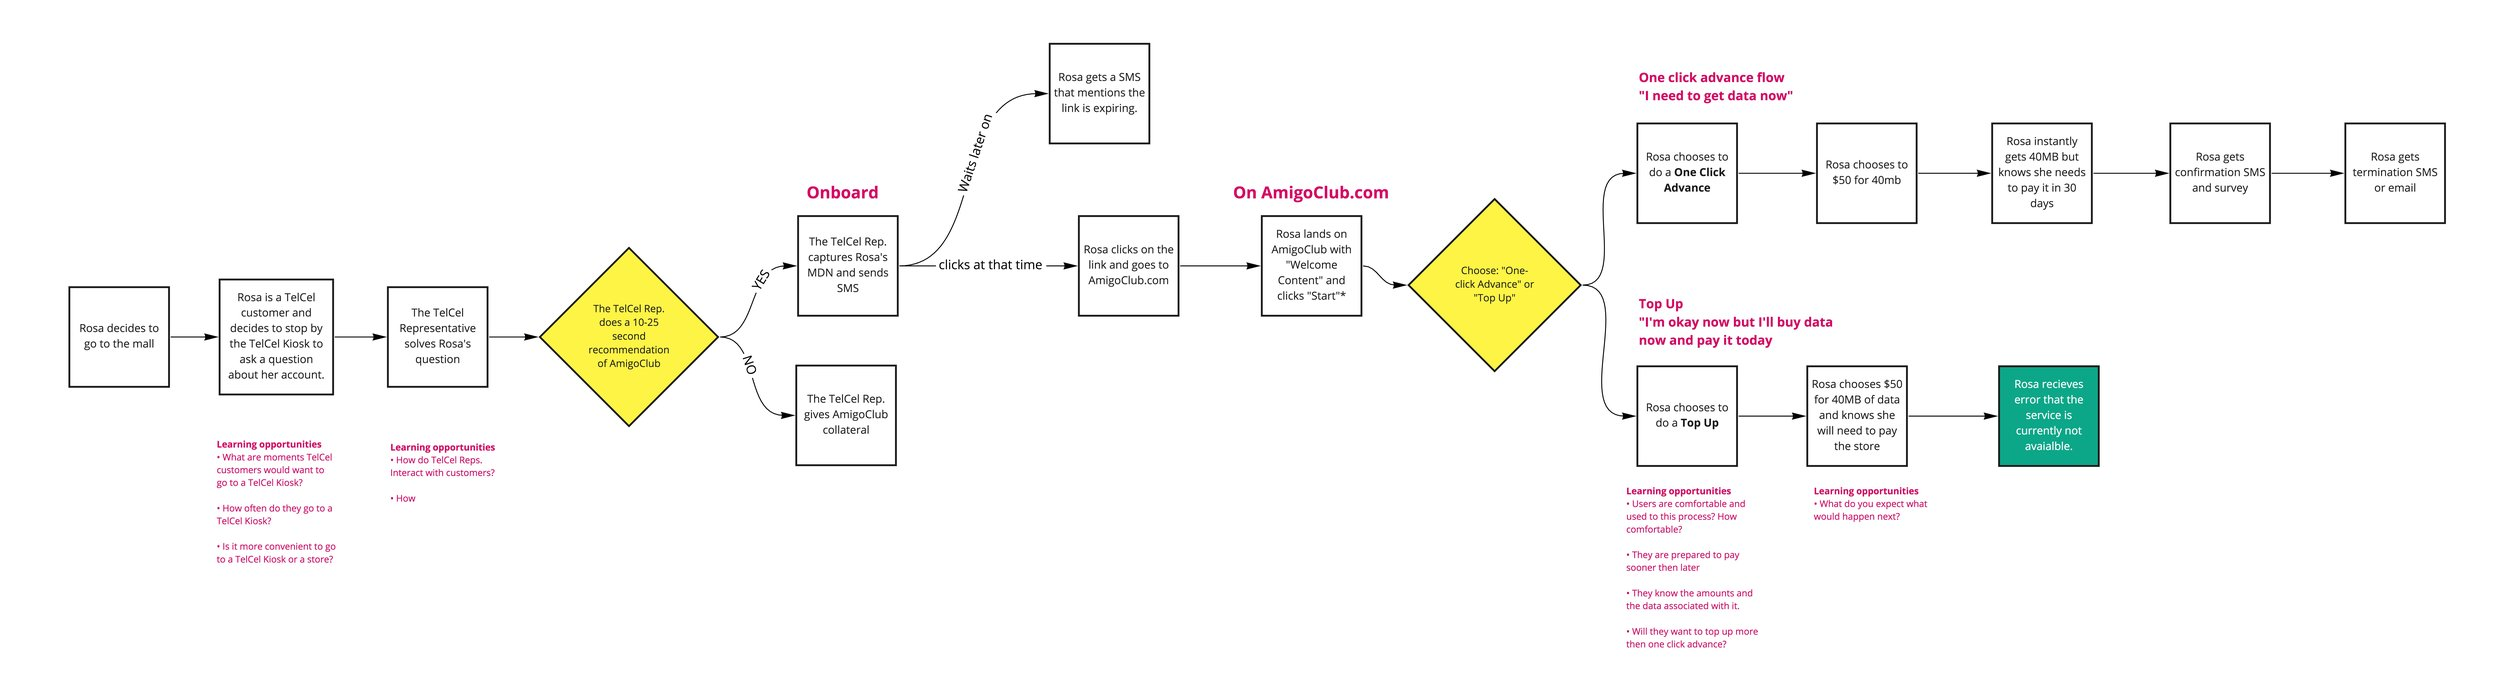 AmigoClub Barn Raiser - User flow v1 (3).jpg